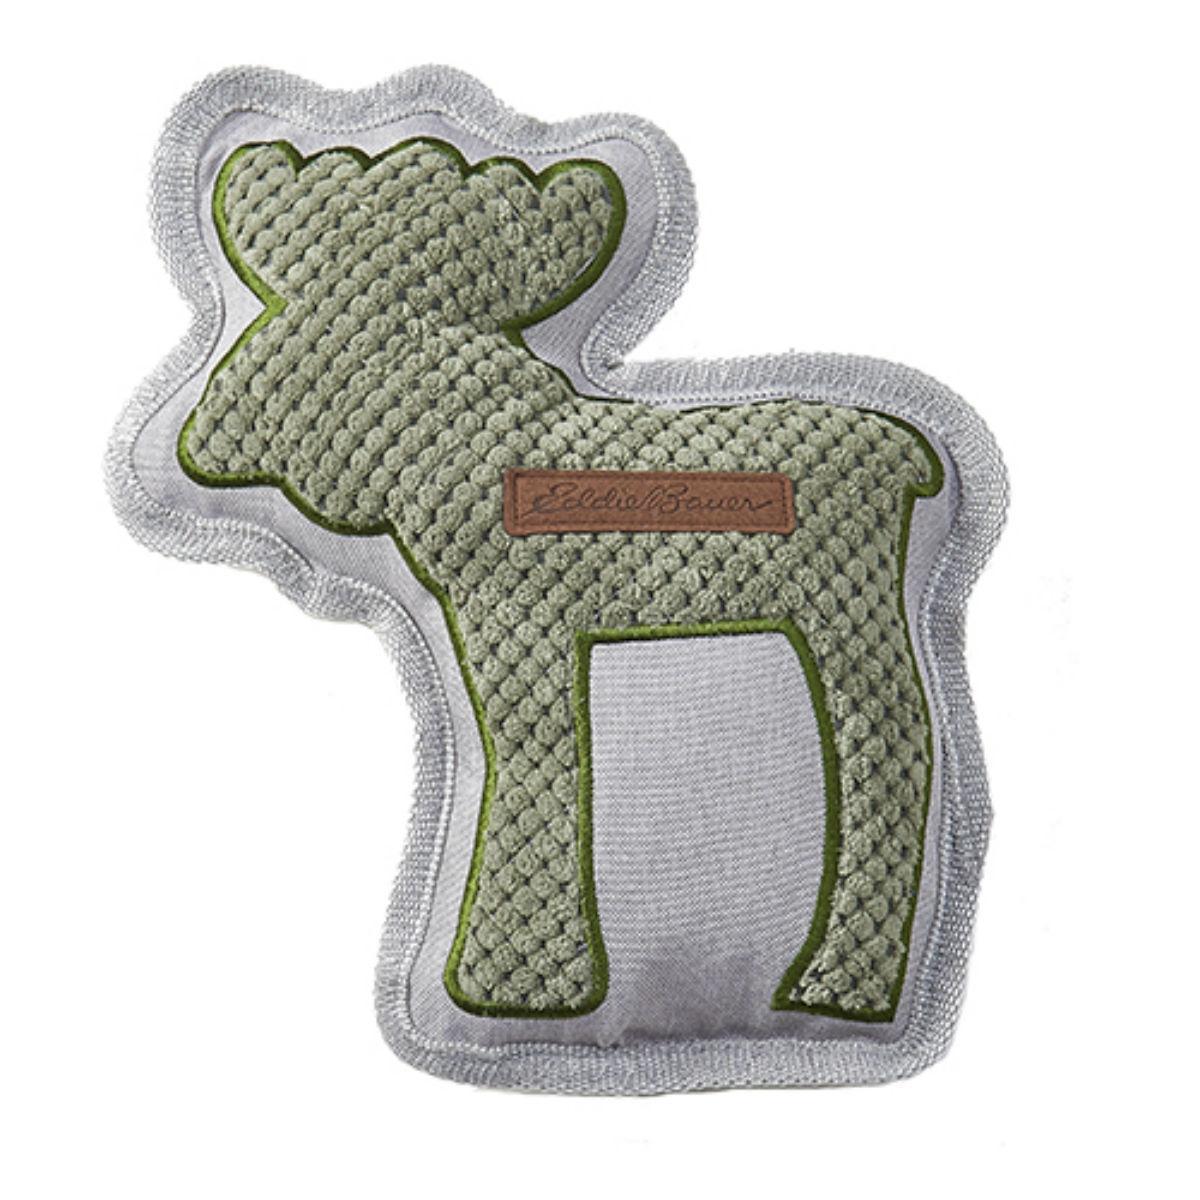 Eddie Bauer Quilted Plush Moose Dog Toy - Green